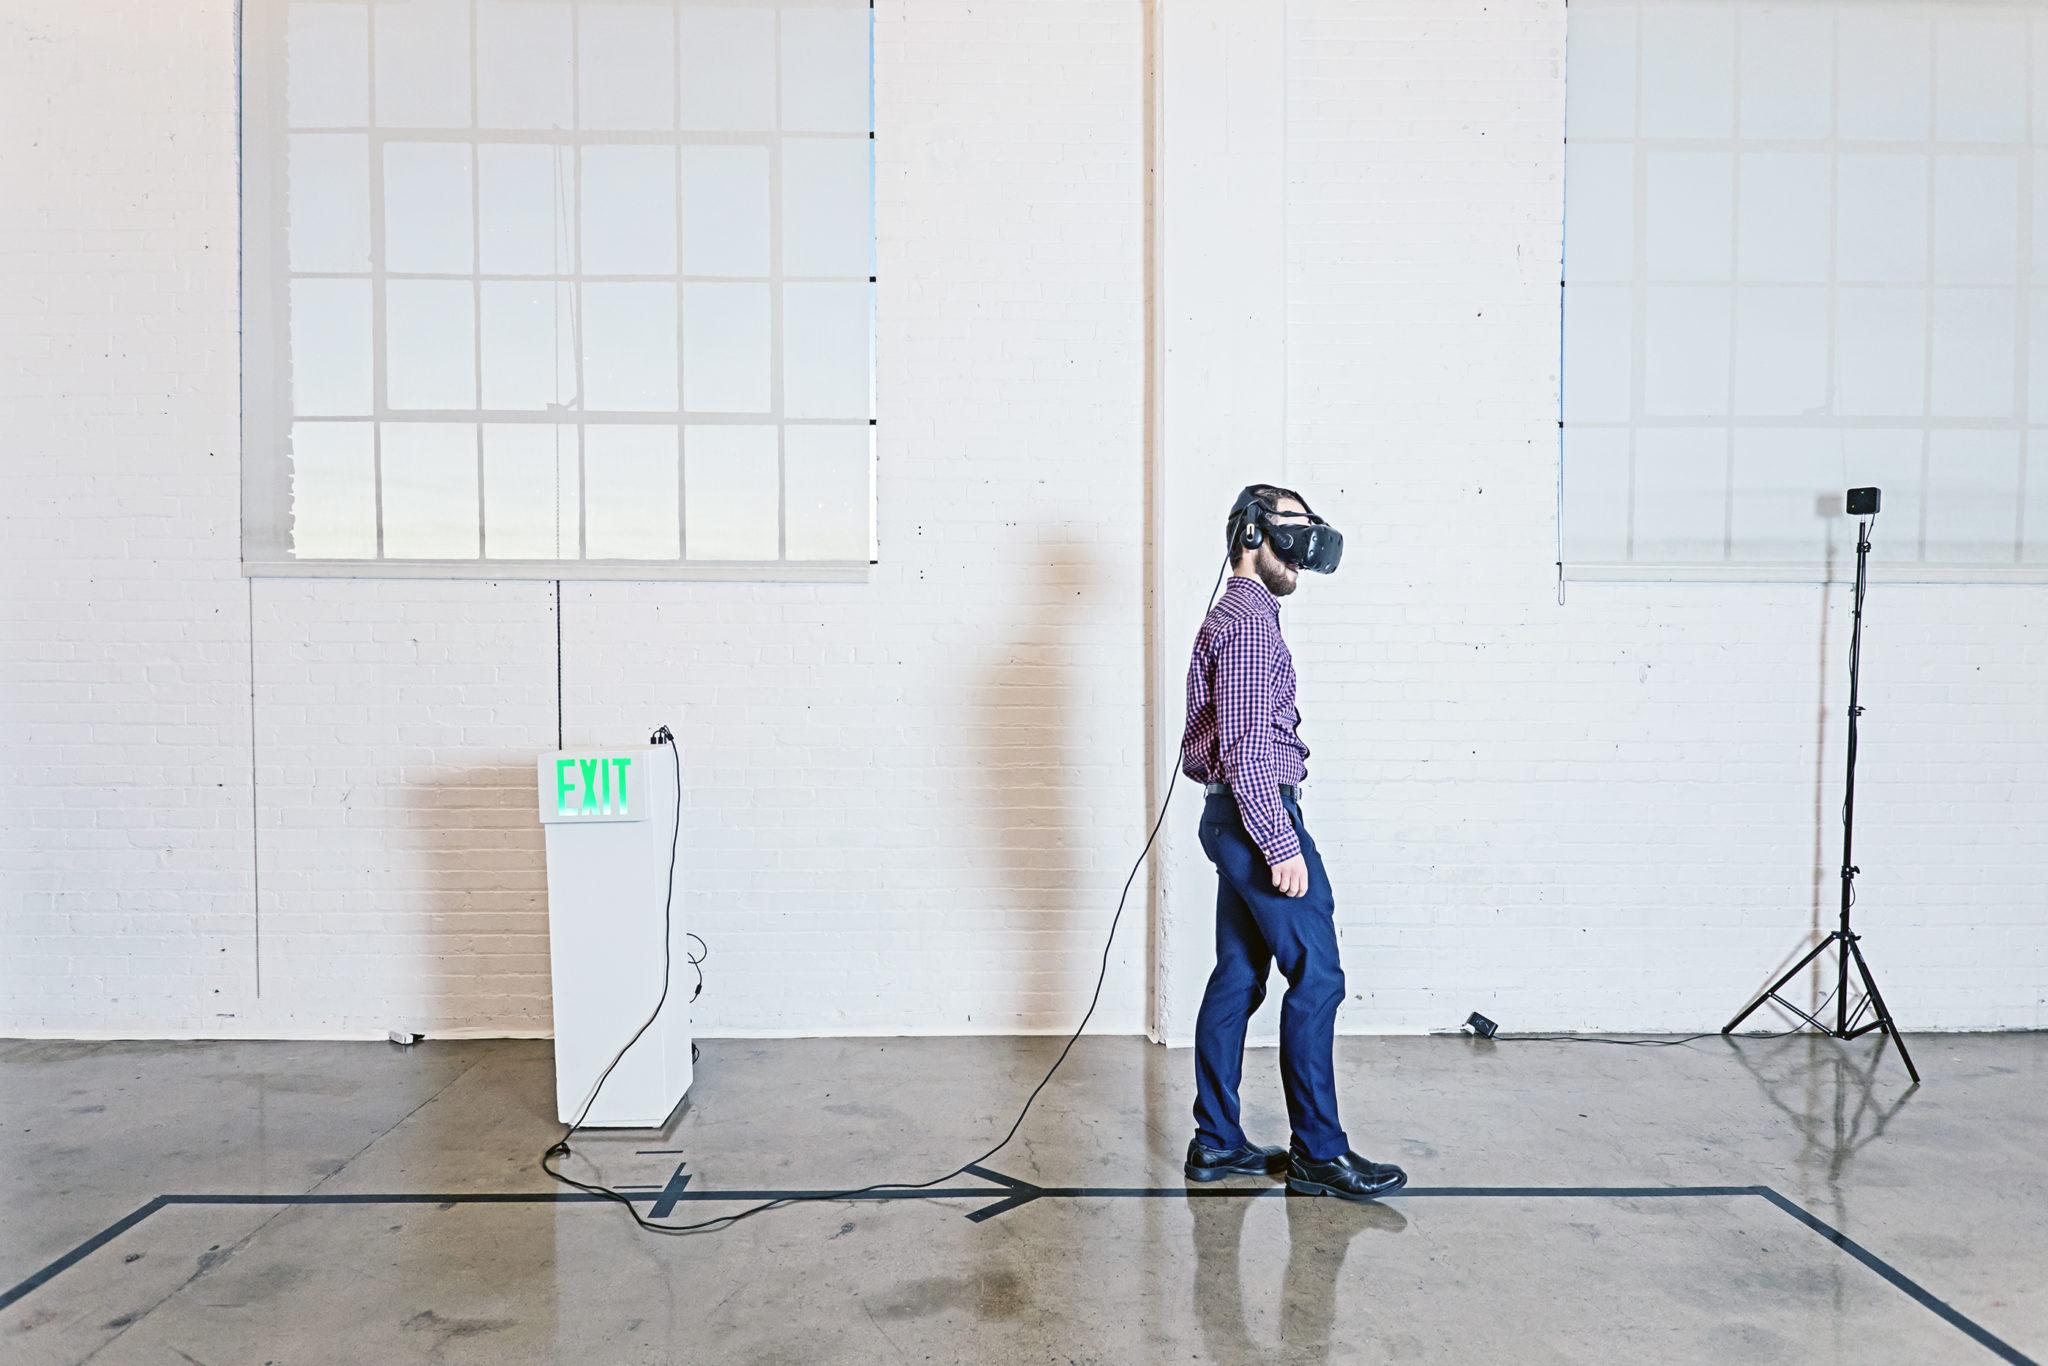 Fine Arts Graduate Student Creates VR Exhibit with Library